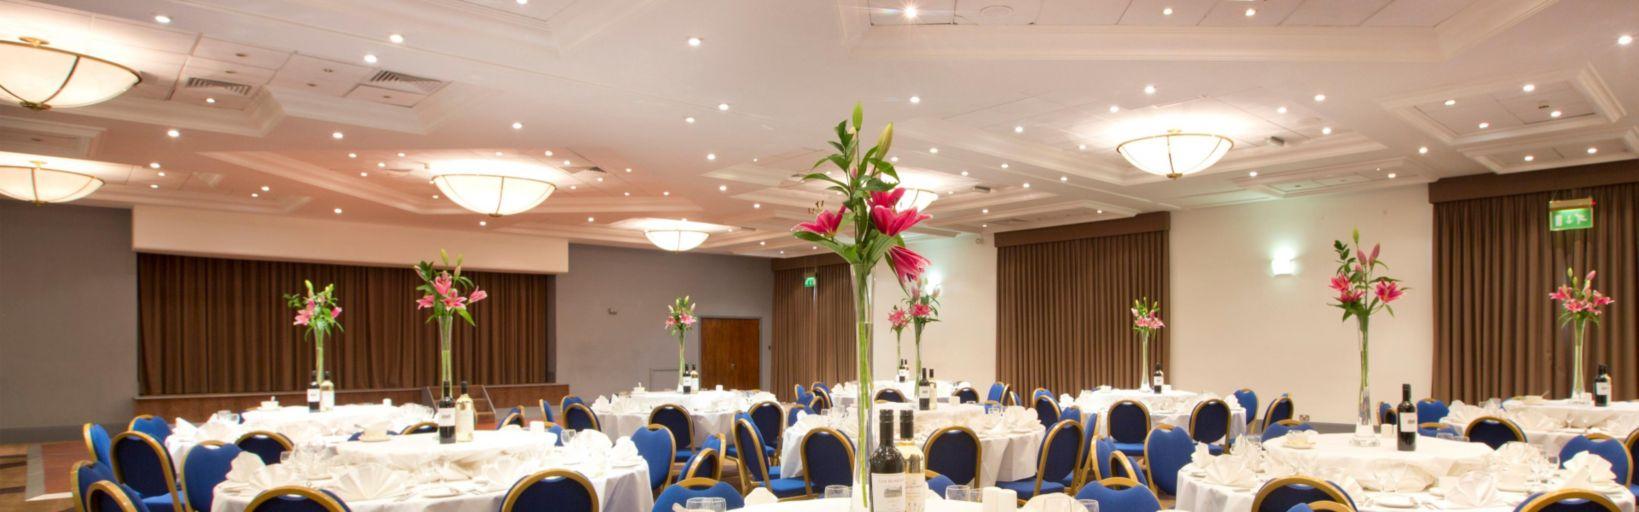 Holiday Inn Peterborough Hotels Holiday Inn Peterborough West